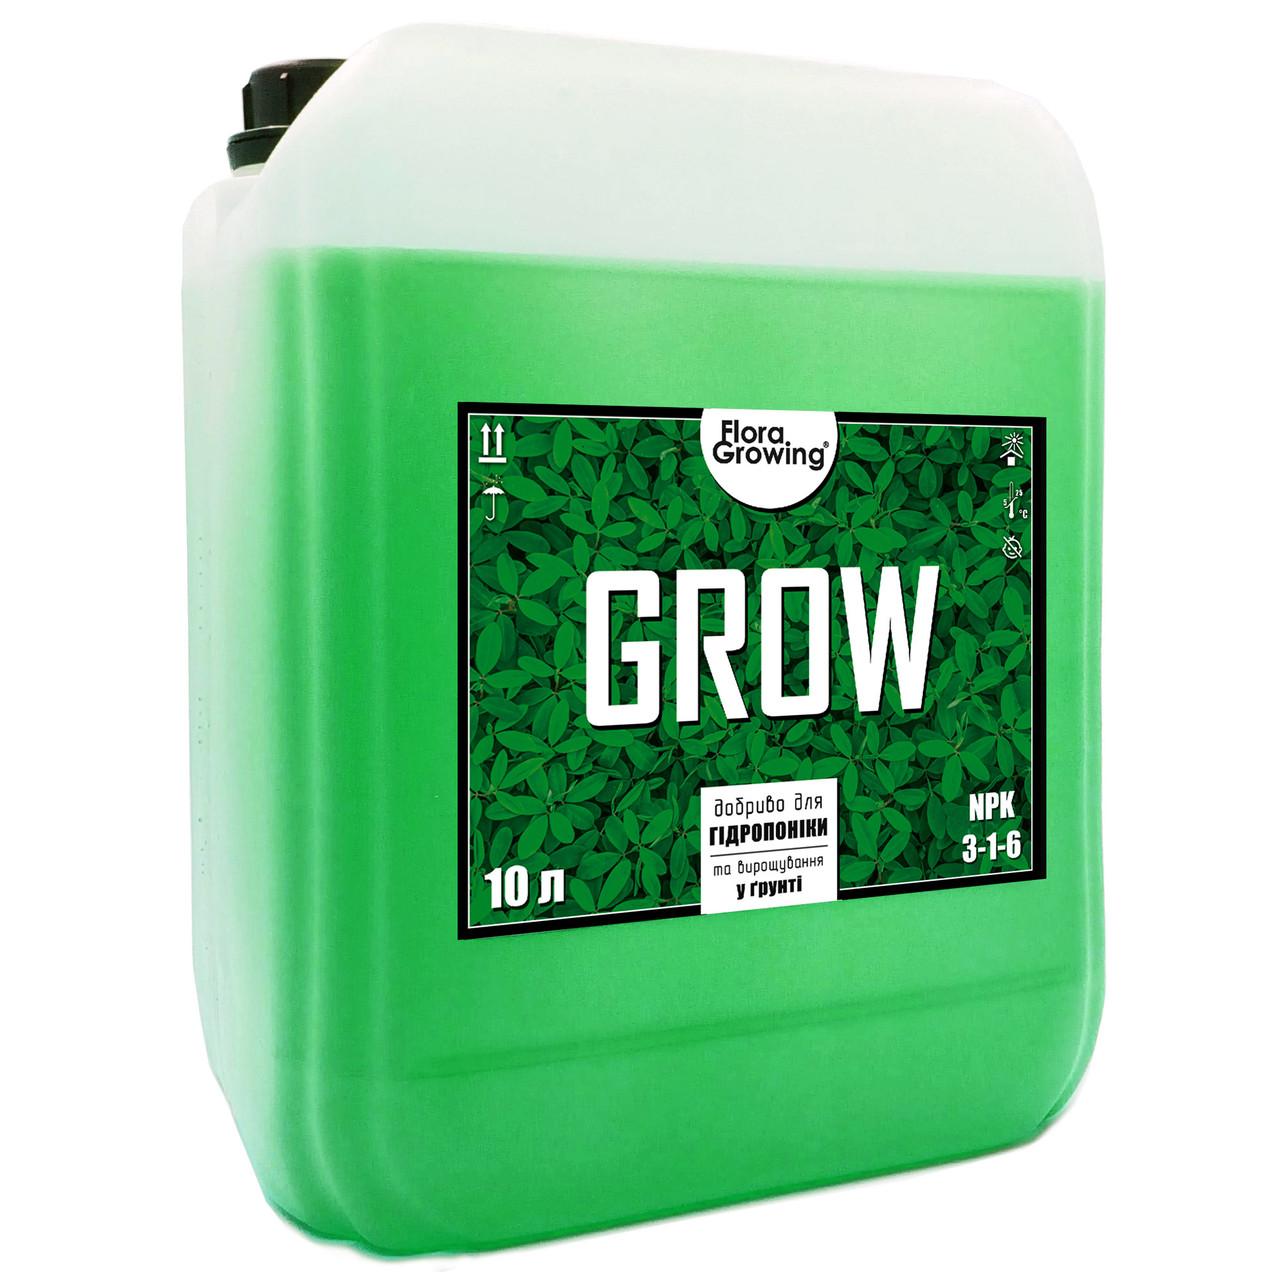 10 л Grow - компонент удобрений для гидропоники и почвы аналог GHE